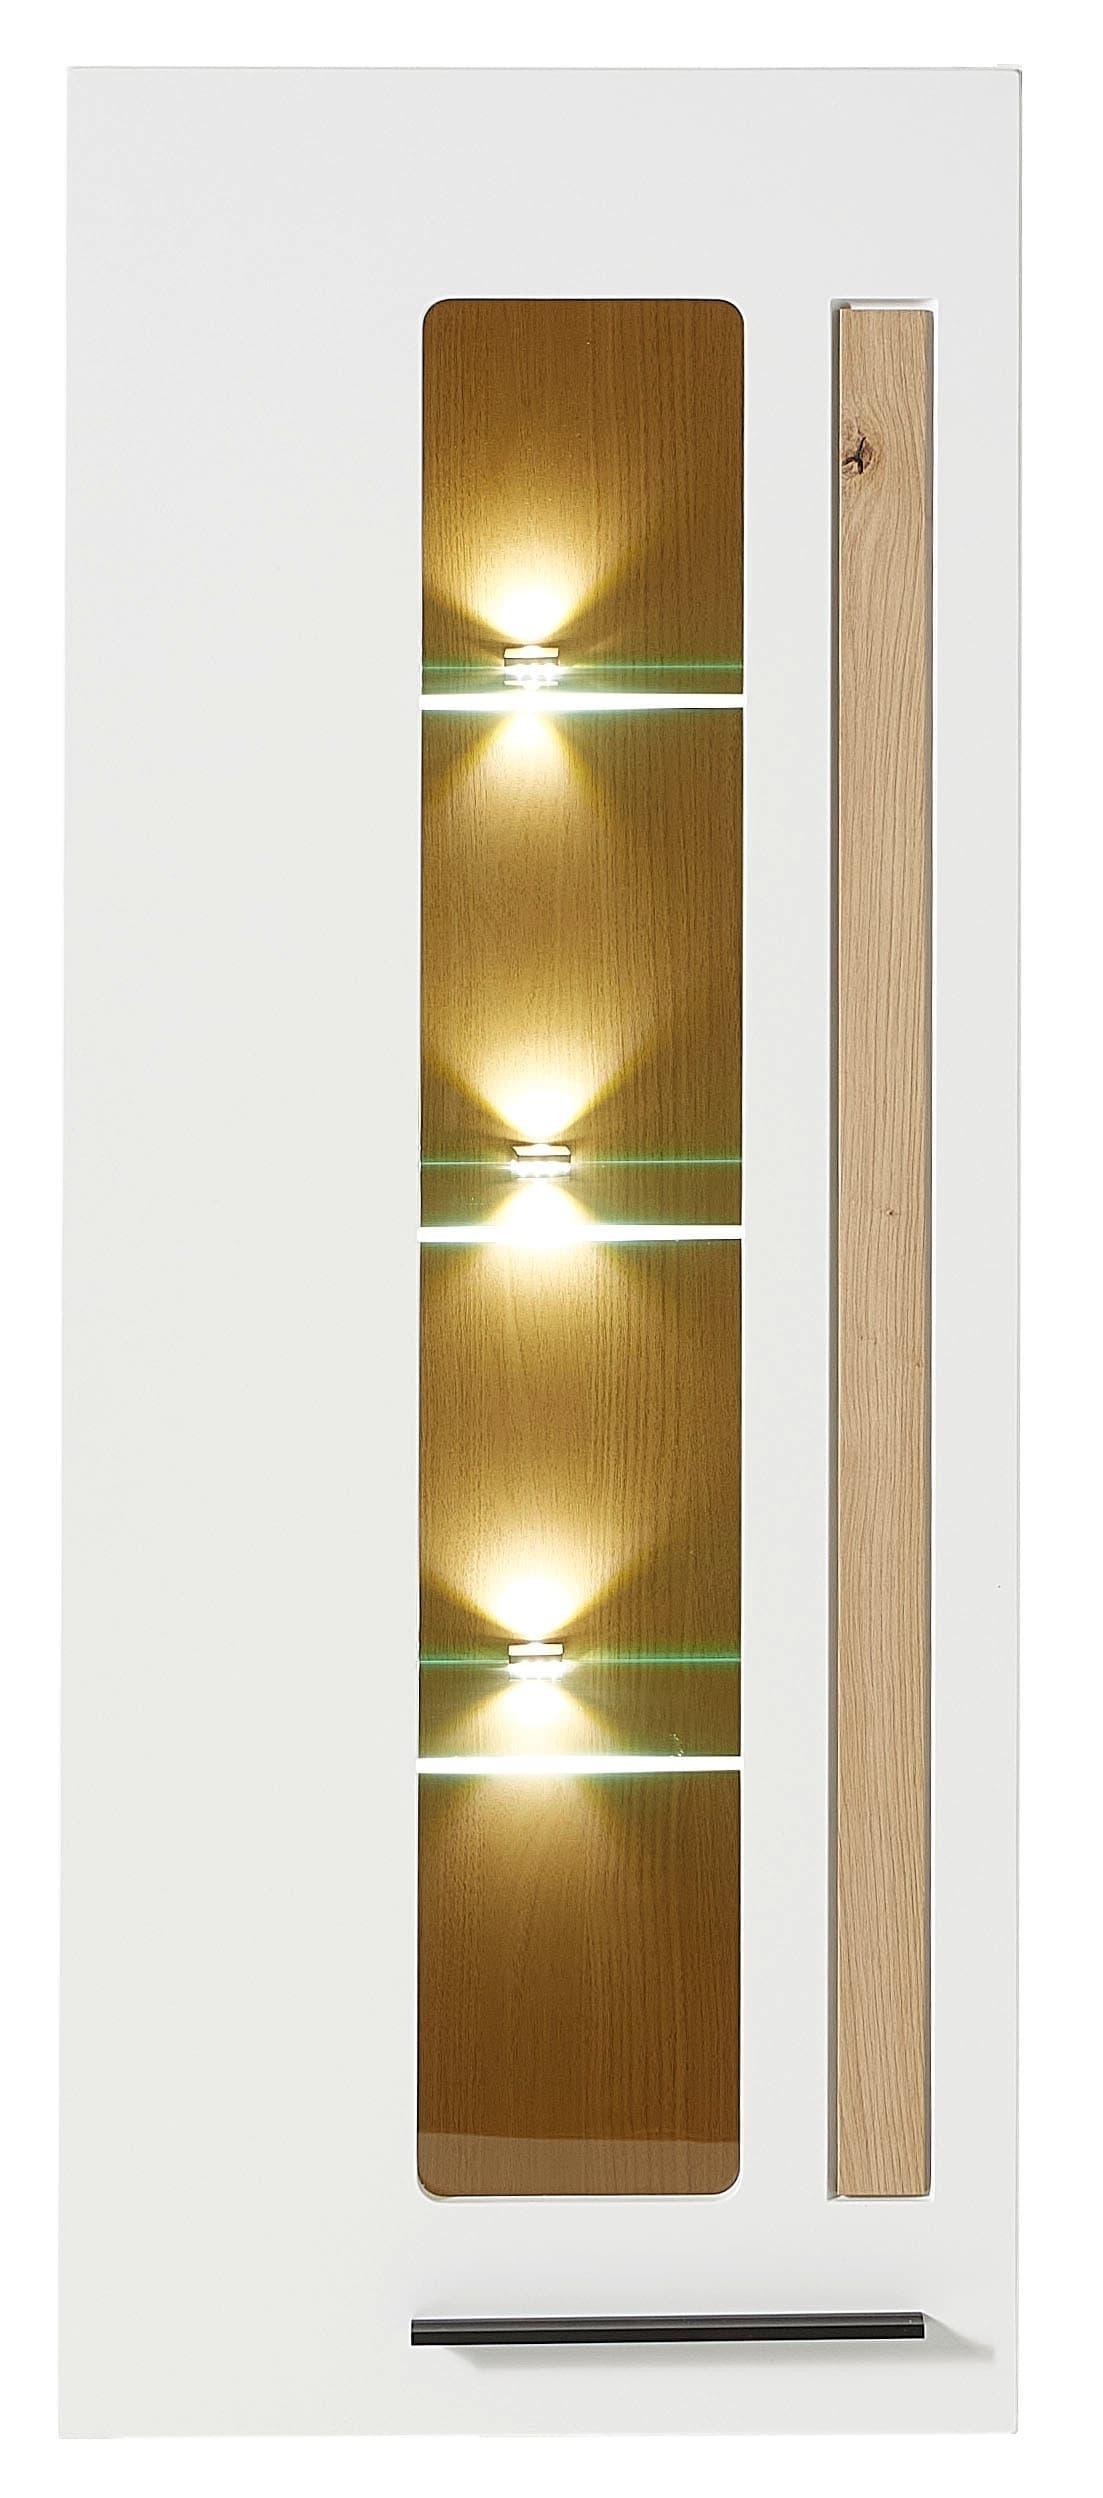 Vitrina suspendata din MDF, cu 1 usa si LED inclus Loftis Alb / Stejar, l52xA37xH128 cm imagine